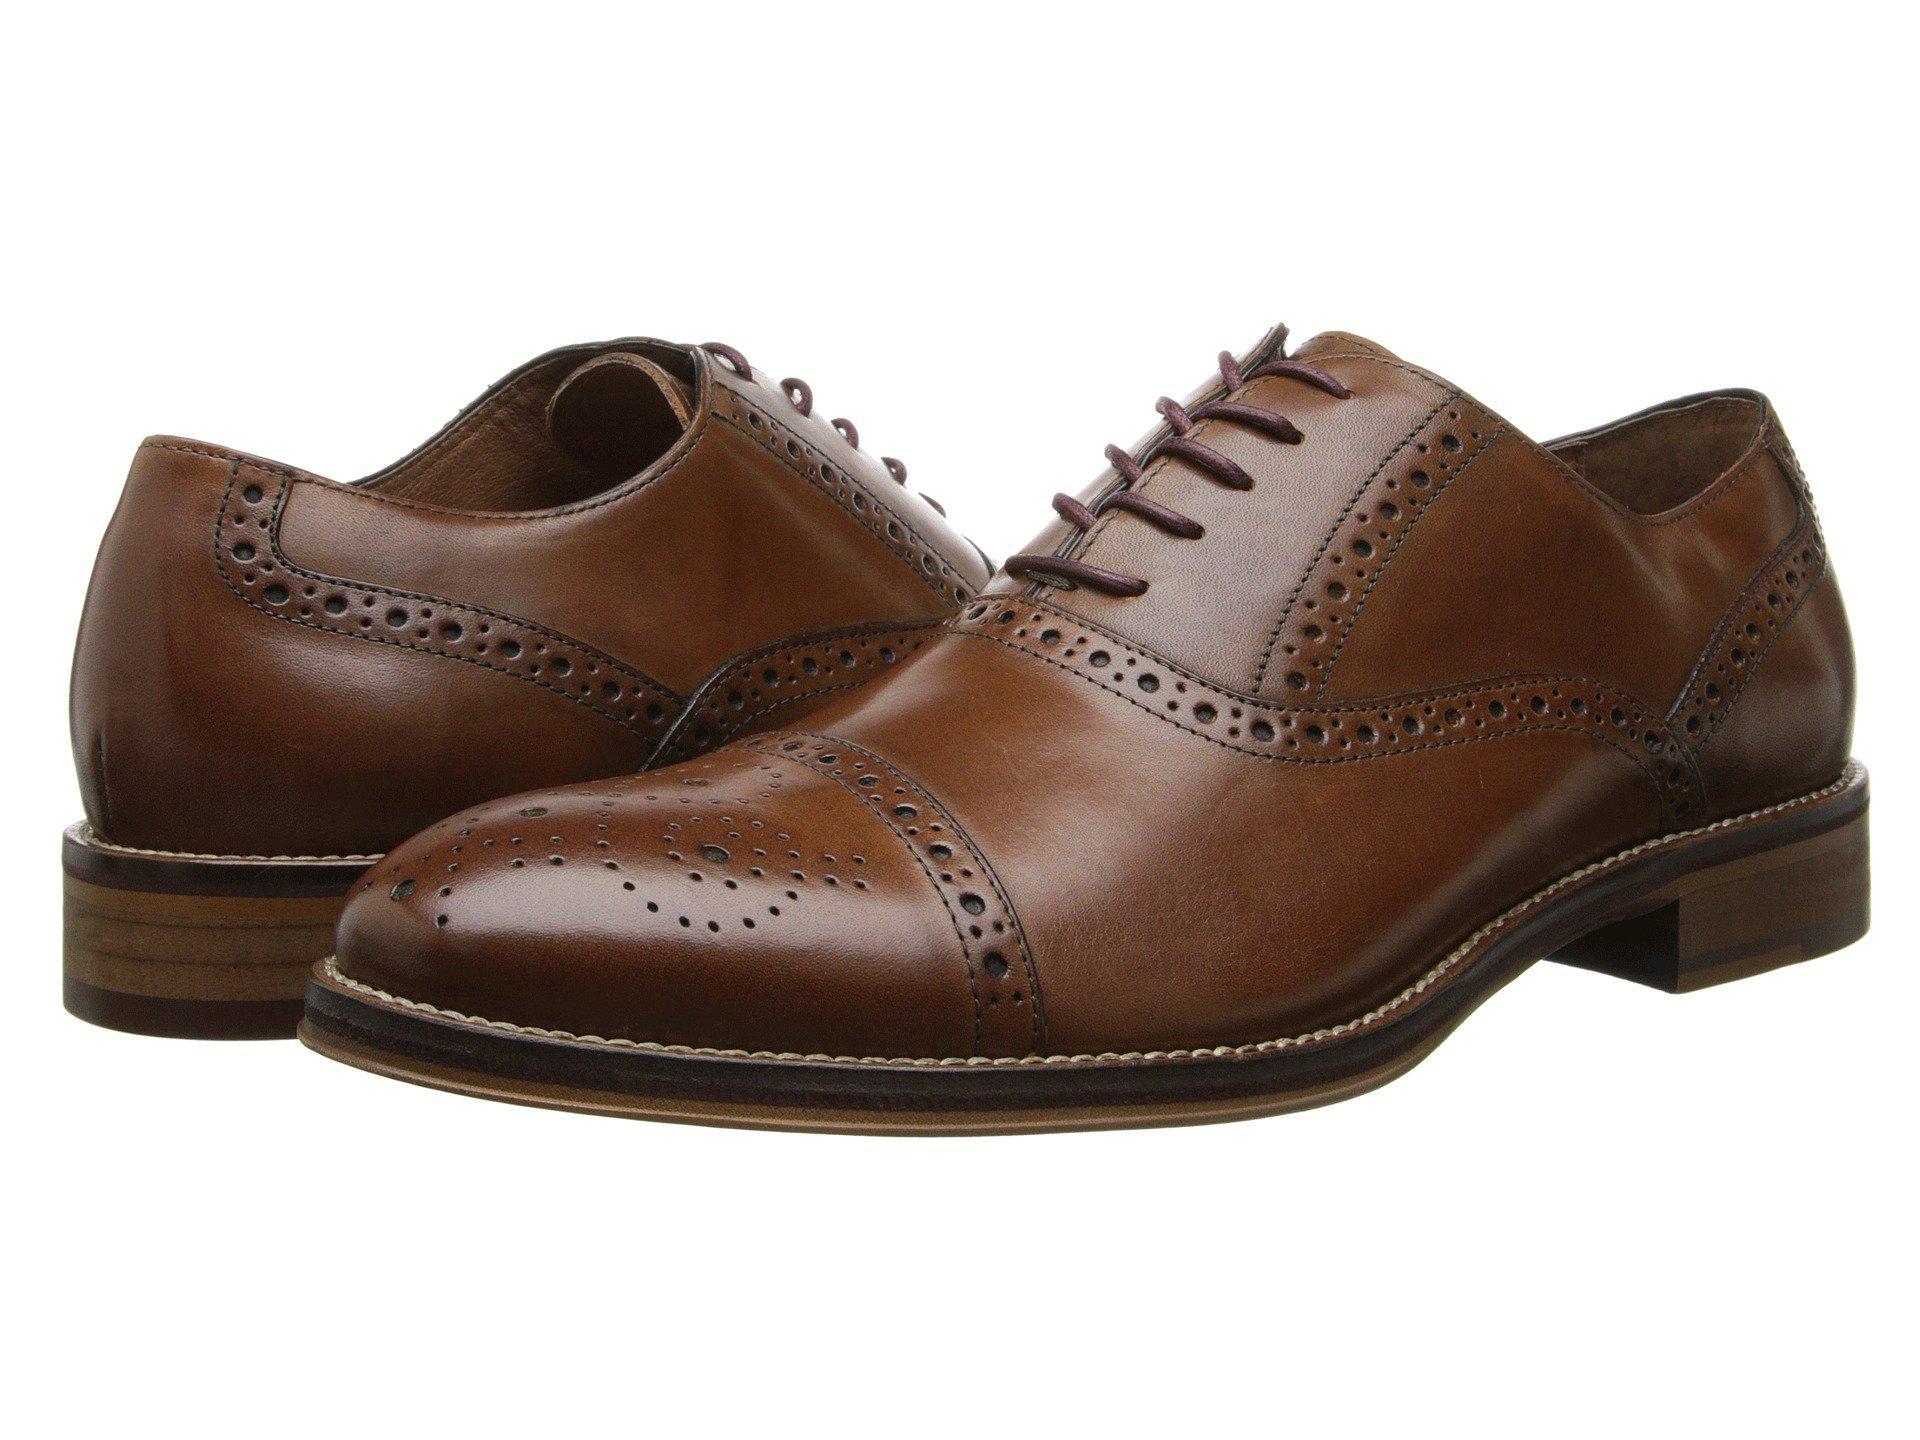 Johnston & MurphyConard Causal Dress Plain Toe Oxford R1UVe